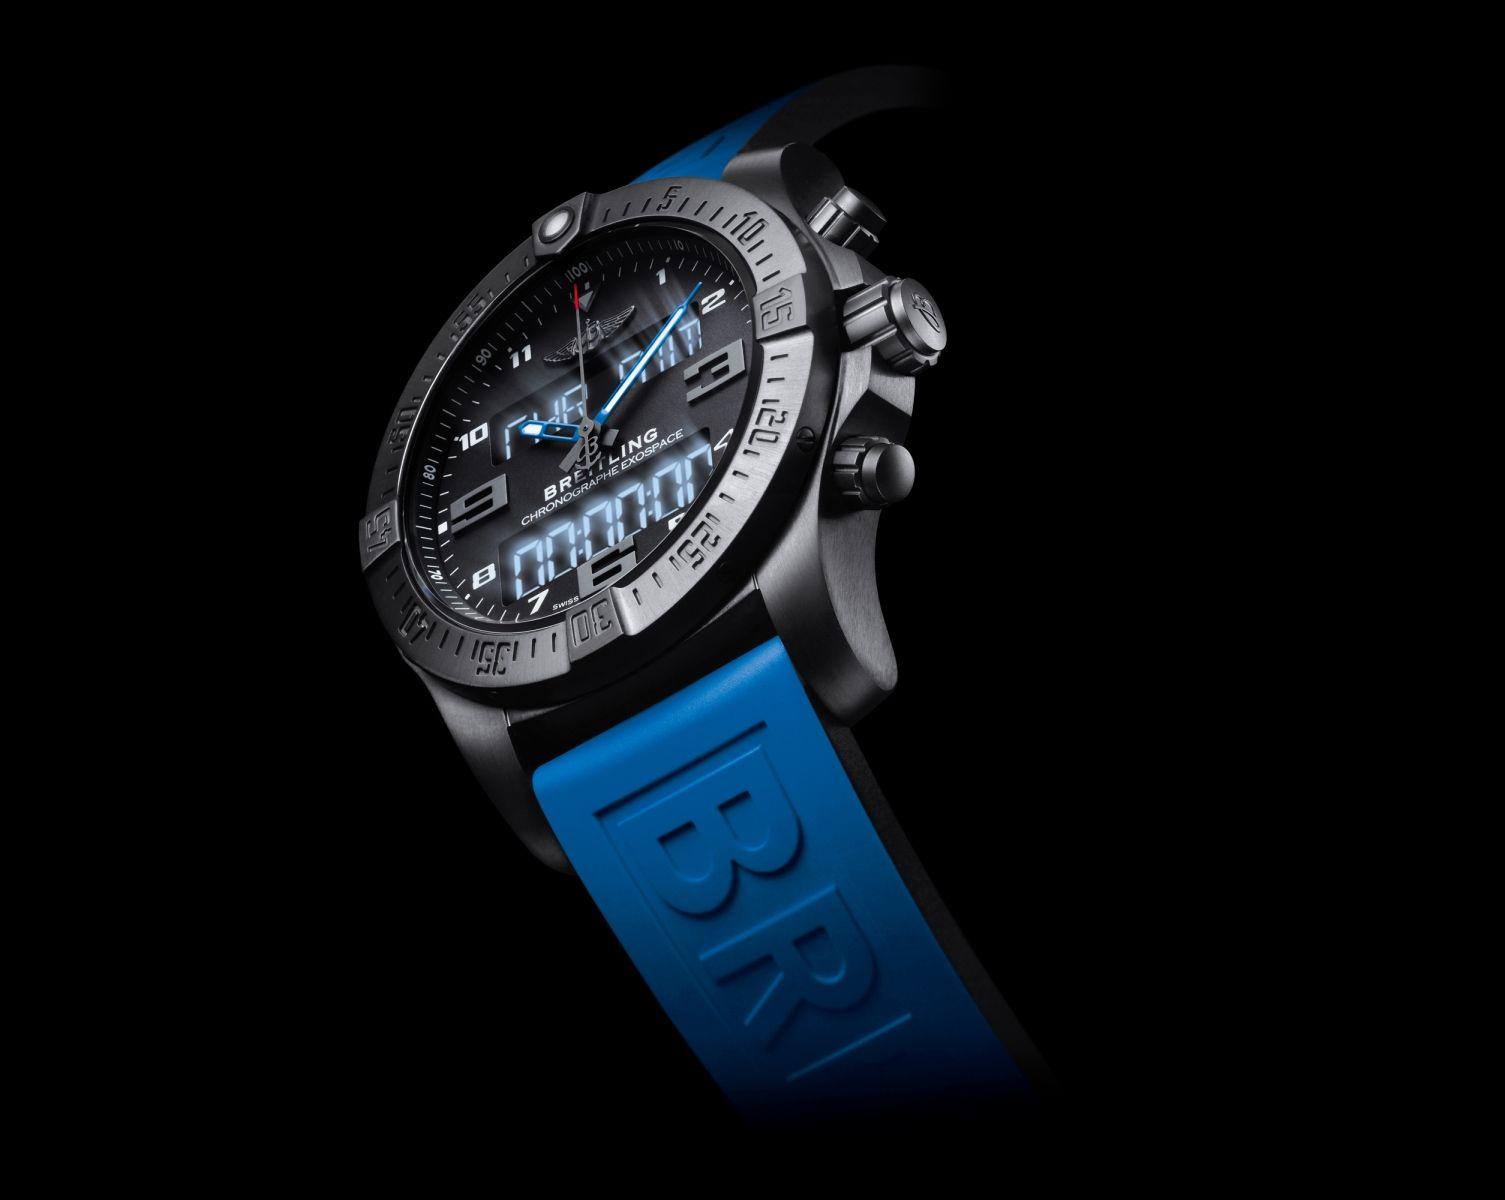 Reloj breitling exospace b55 dimetro de 46 mm con caja de titanio reloj breitling exospace b55 dimetro de 46 mm con caja de titanio negro y correa de caucho azul bretiling rafaeltorresjoyero valencia urtaz Gallery